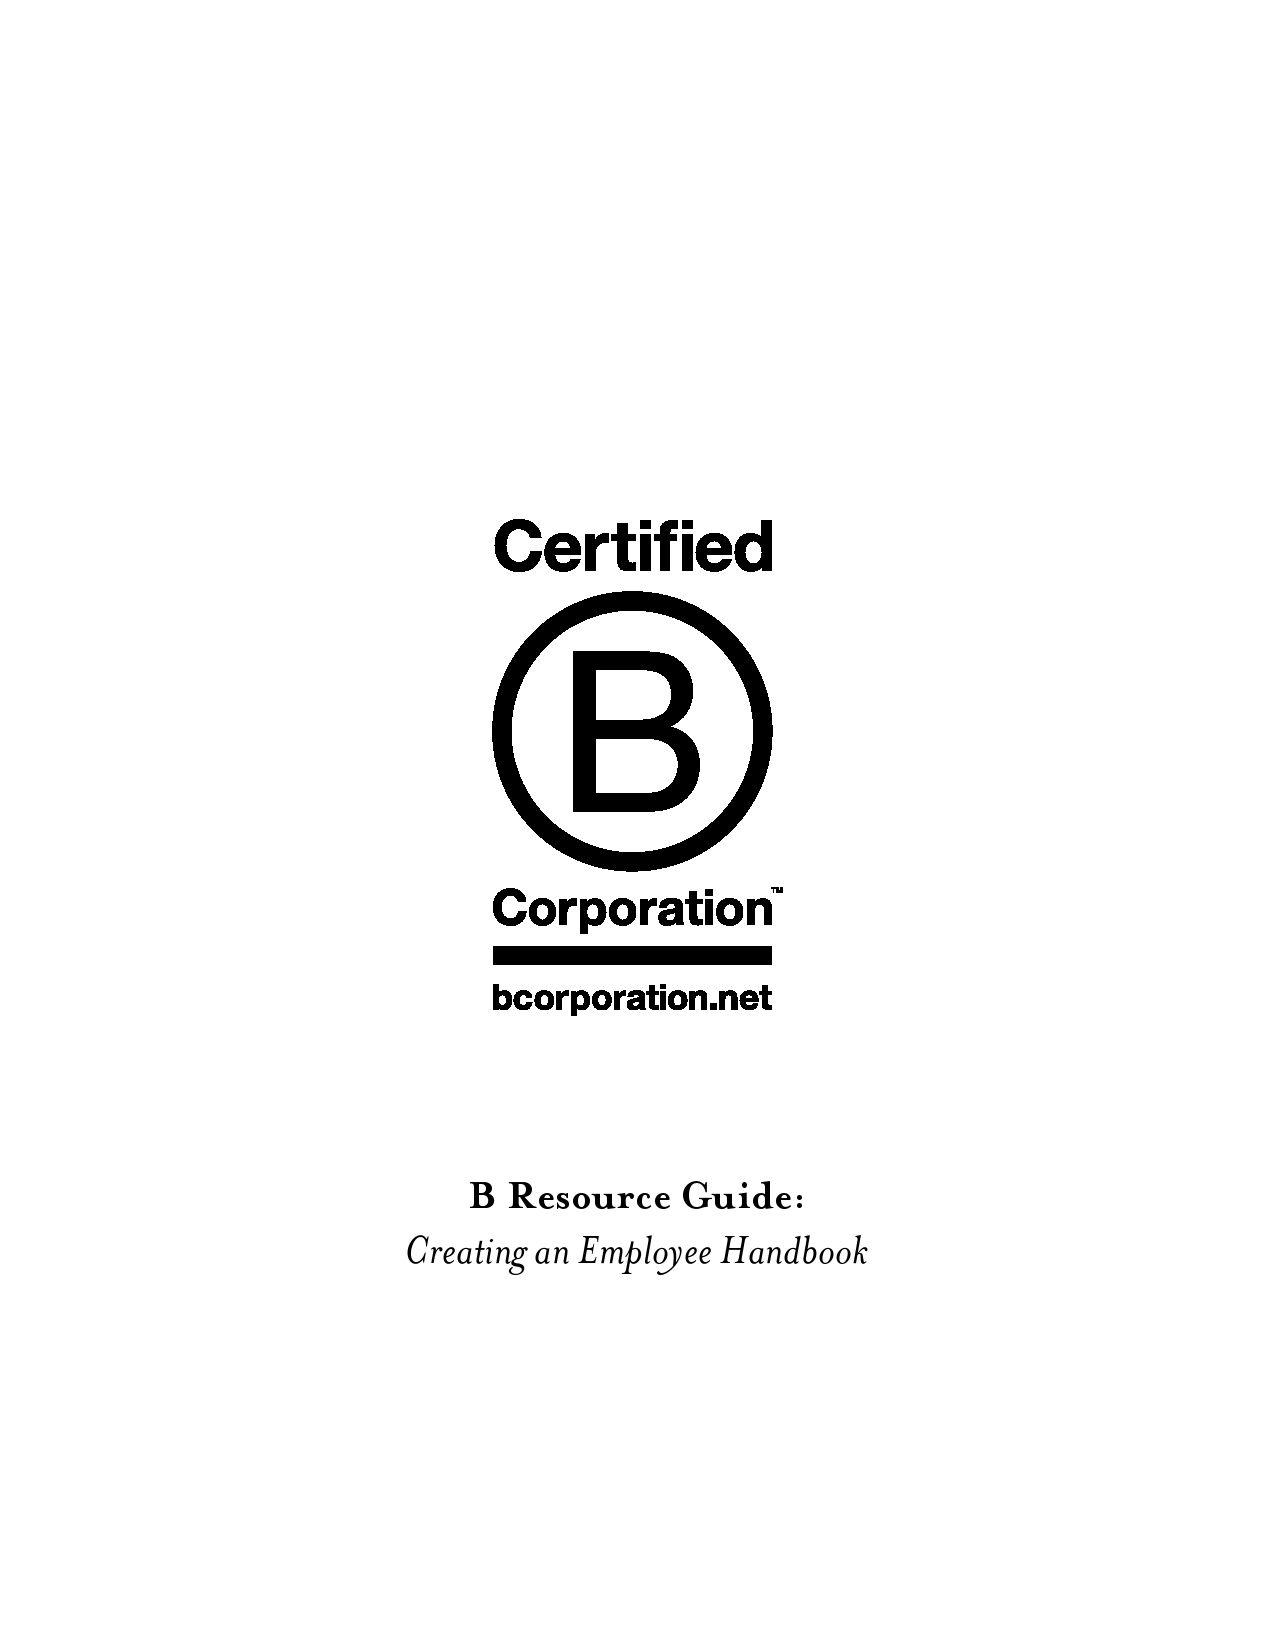 Creating an Employee Handbook by Blacksonville Community